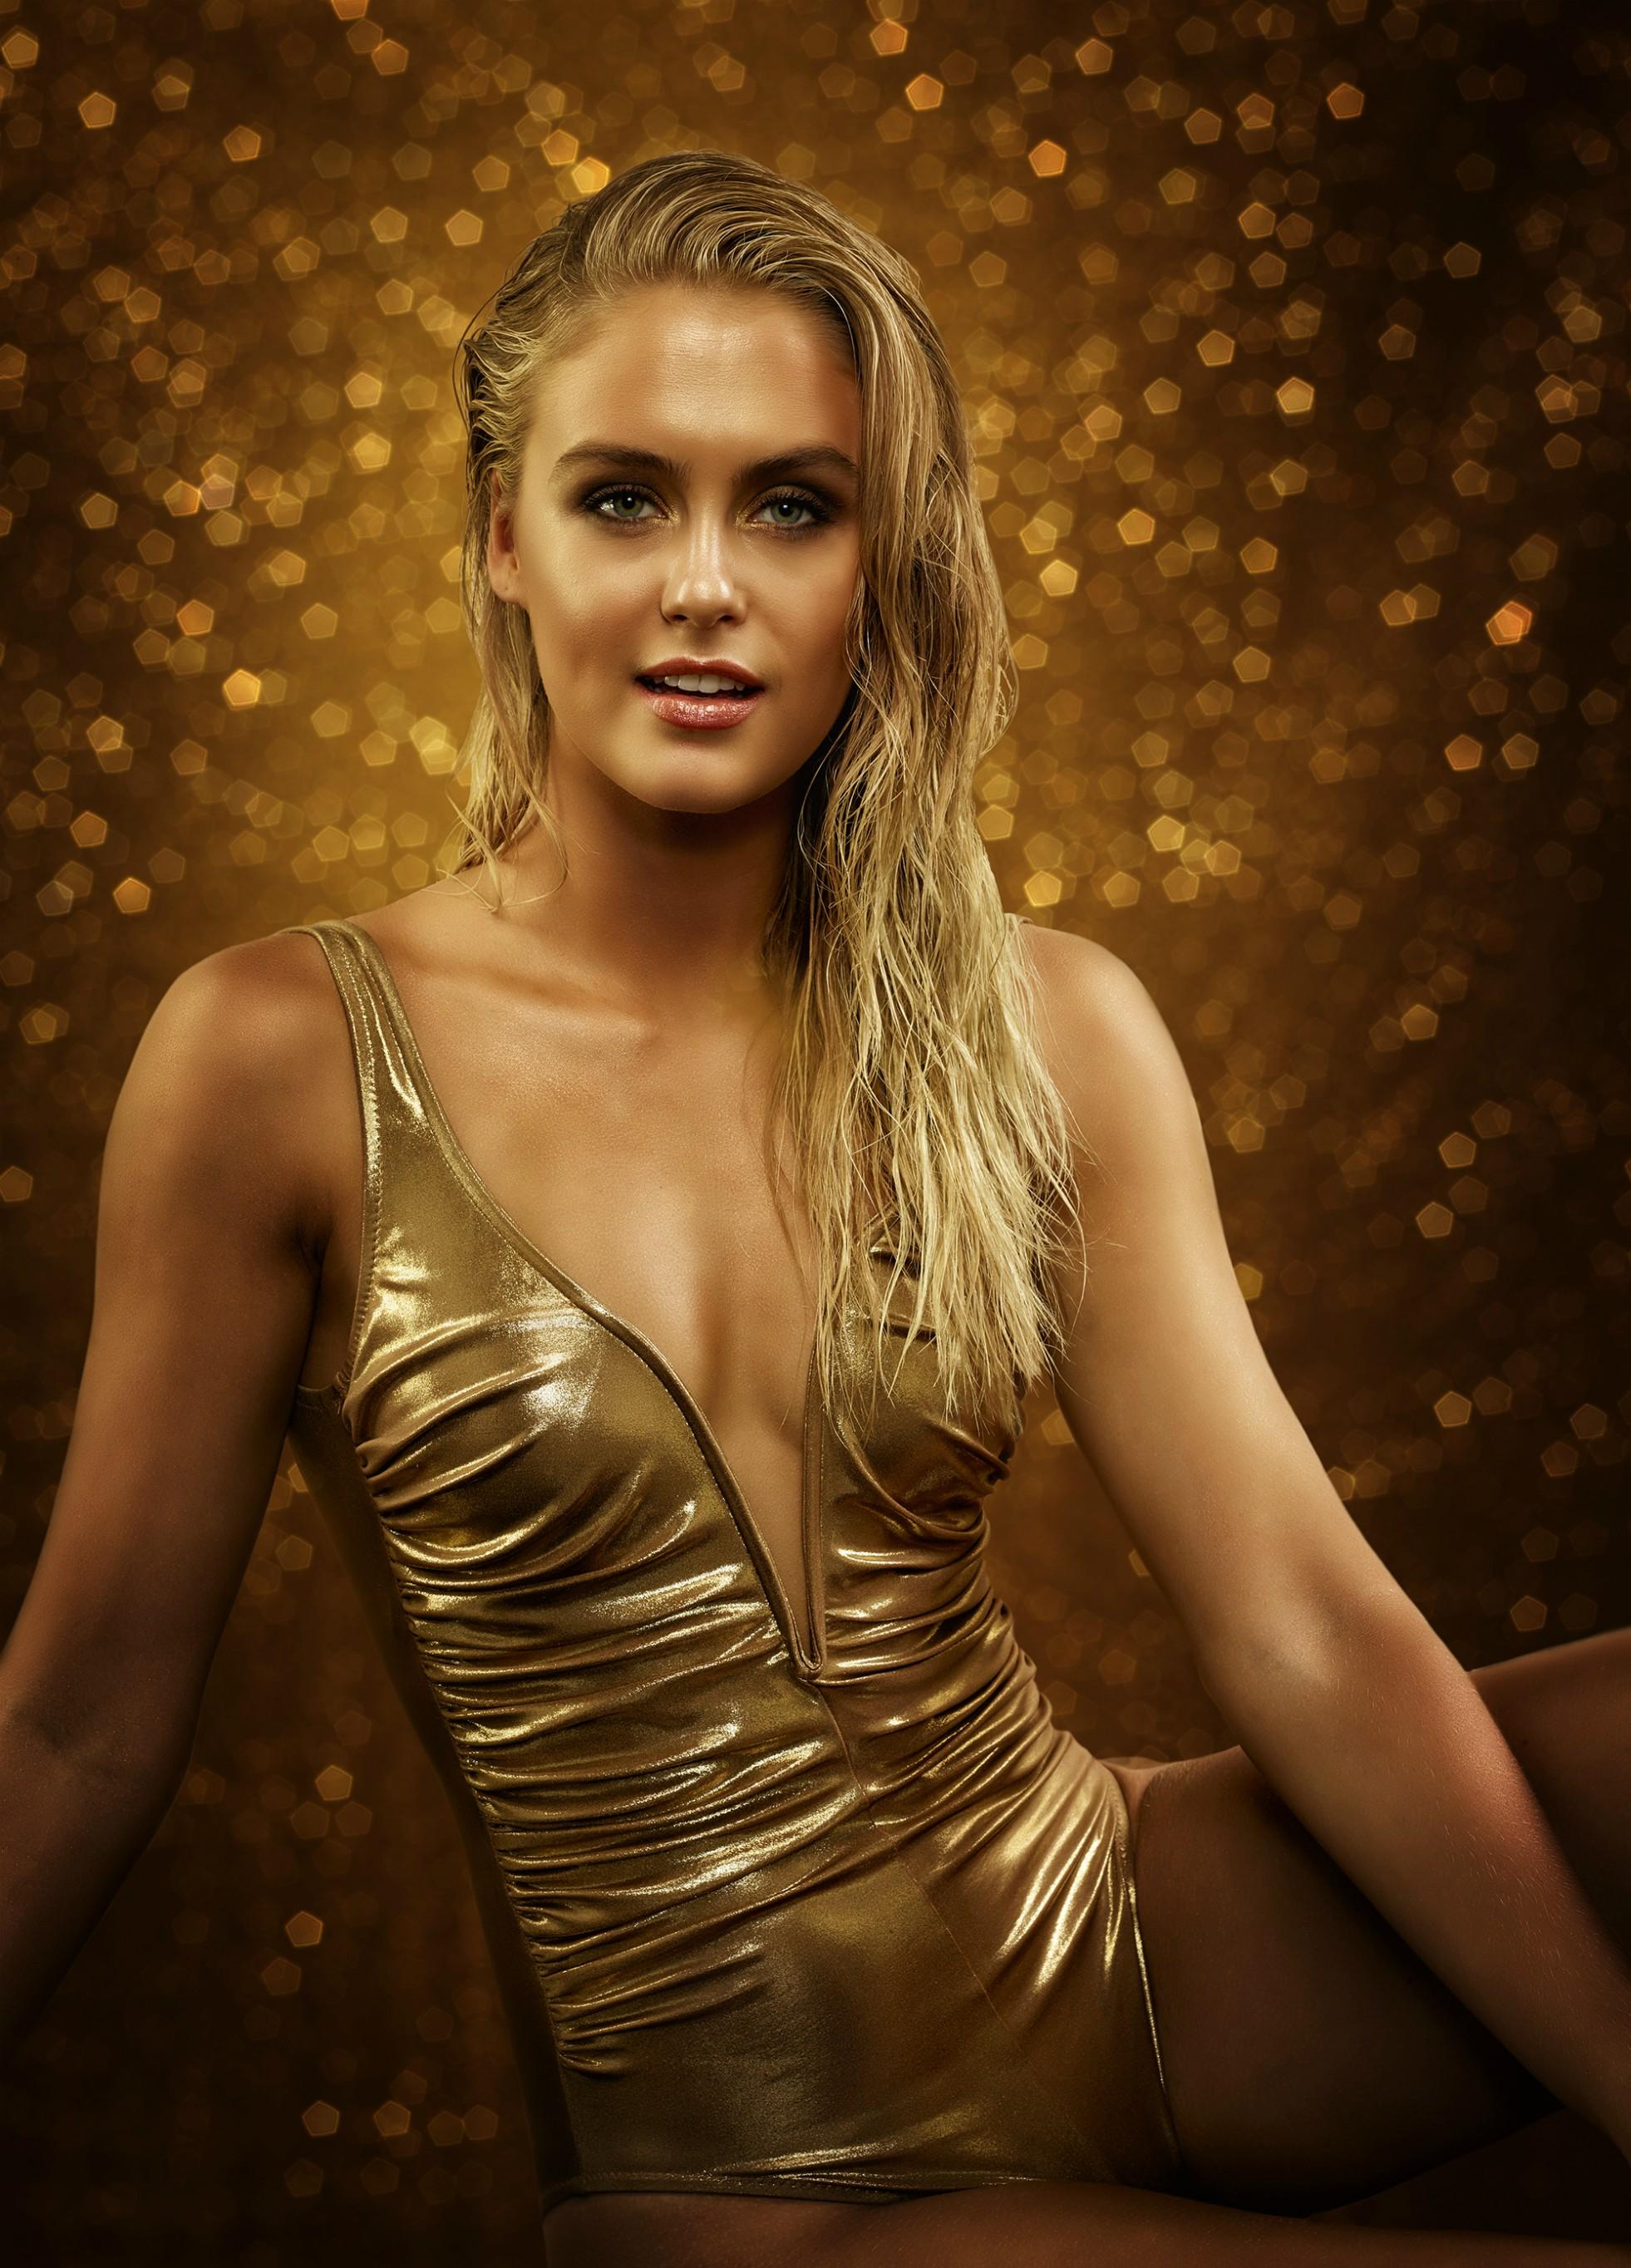 Bondi Sands Liquid Gold campaign image